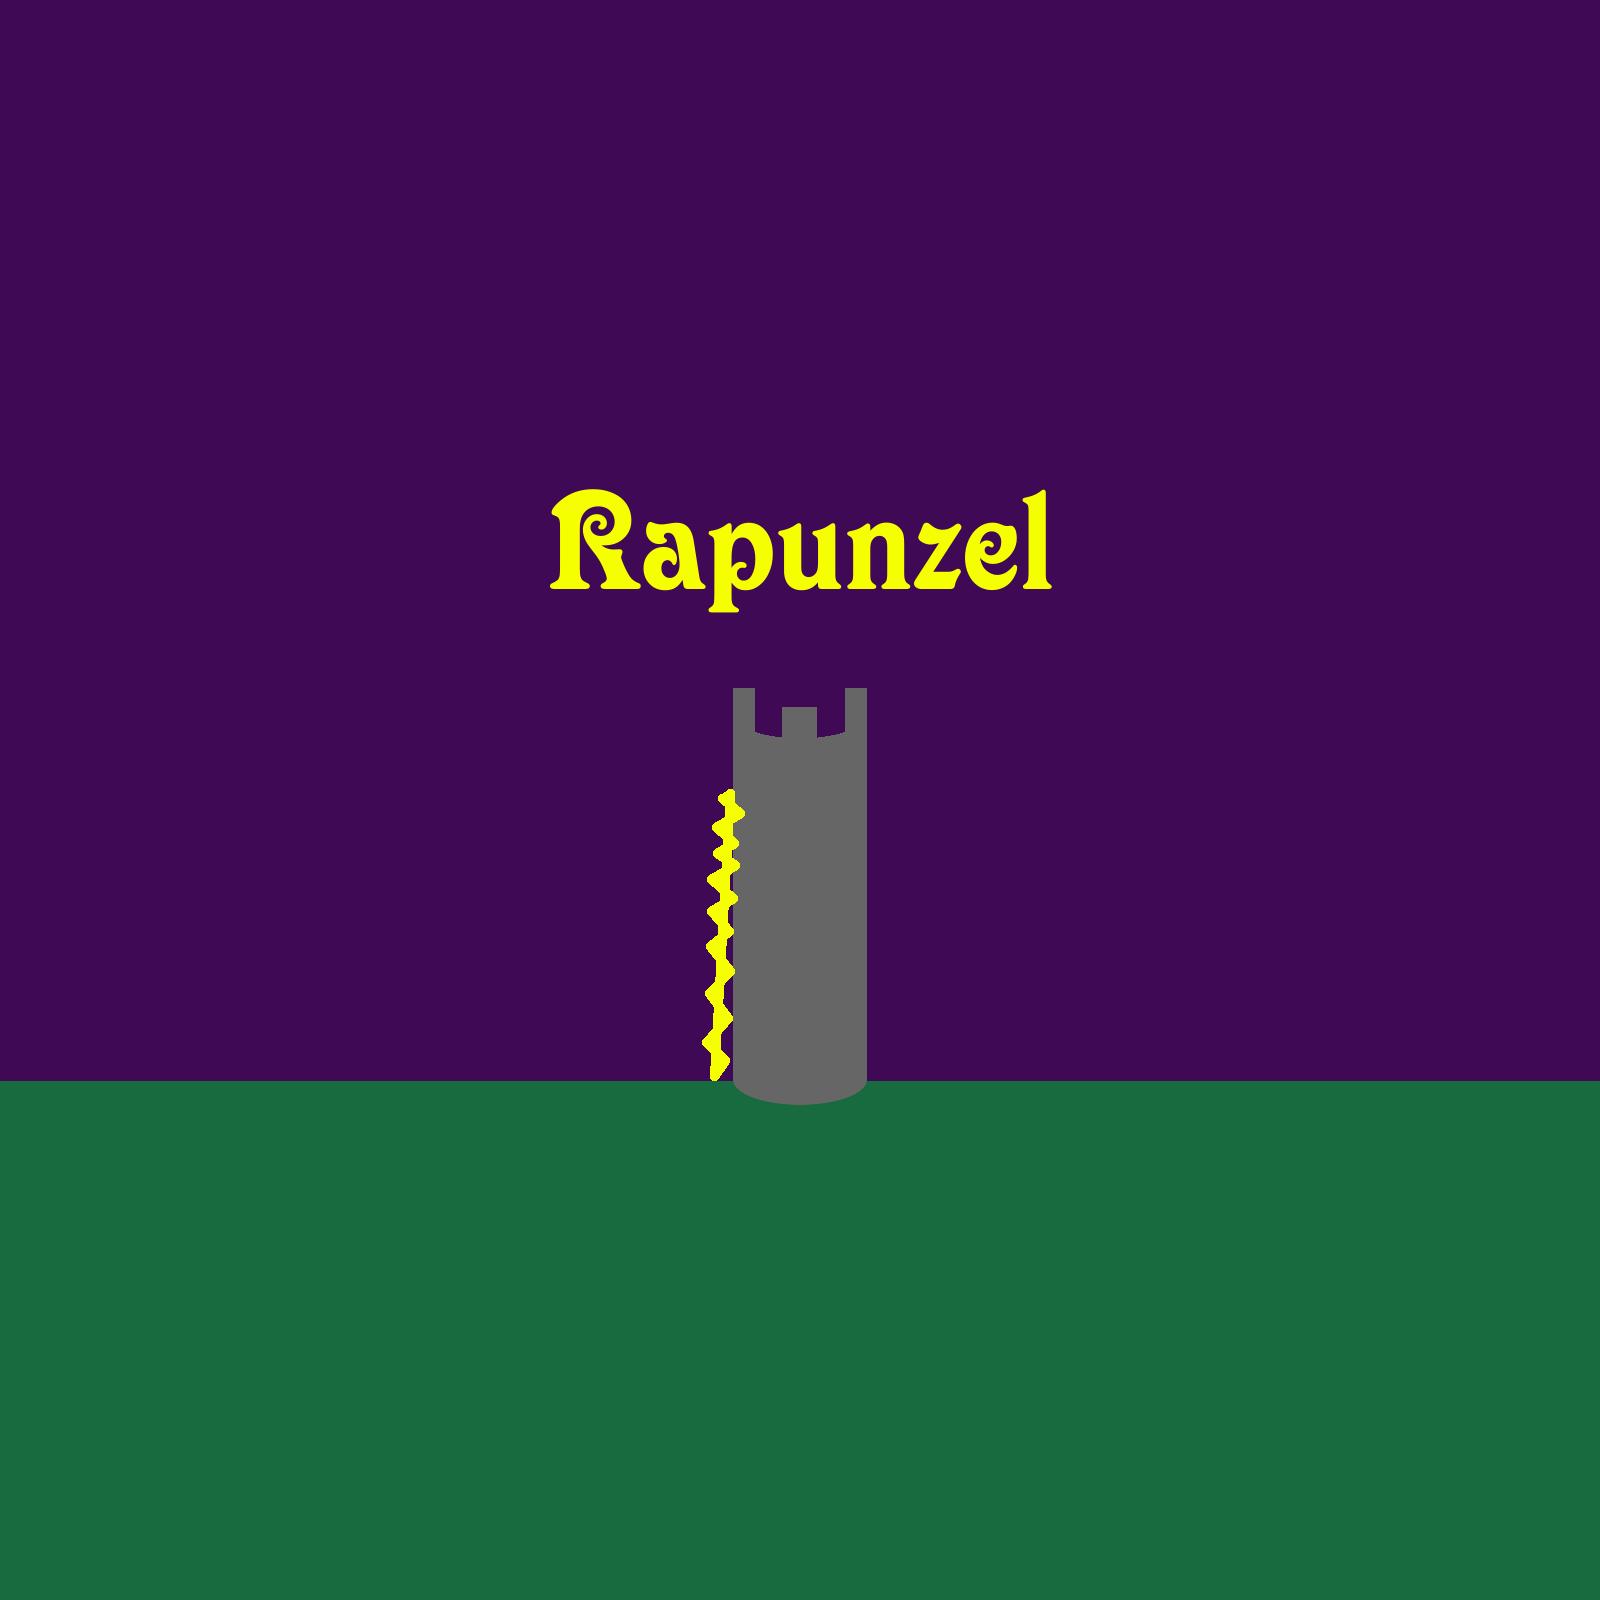 Rapunzel_Web.png